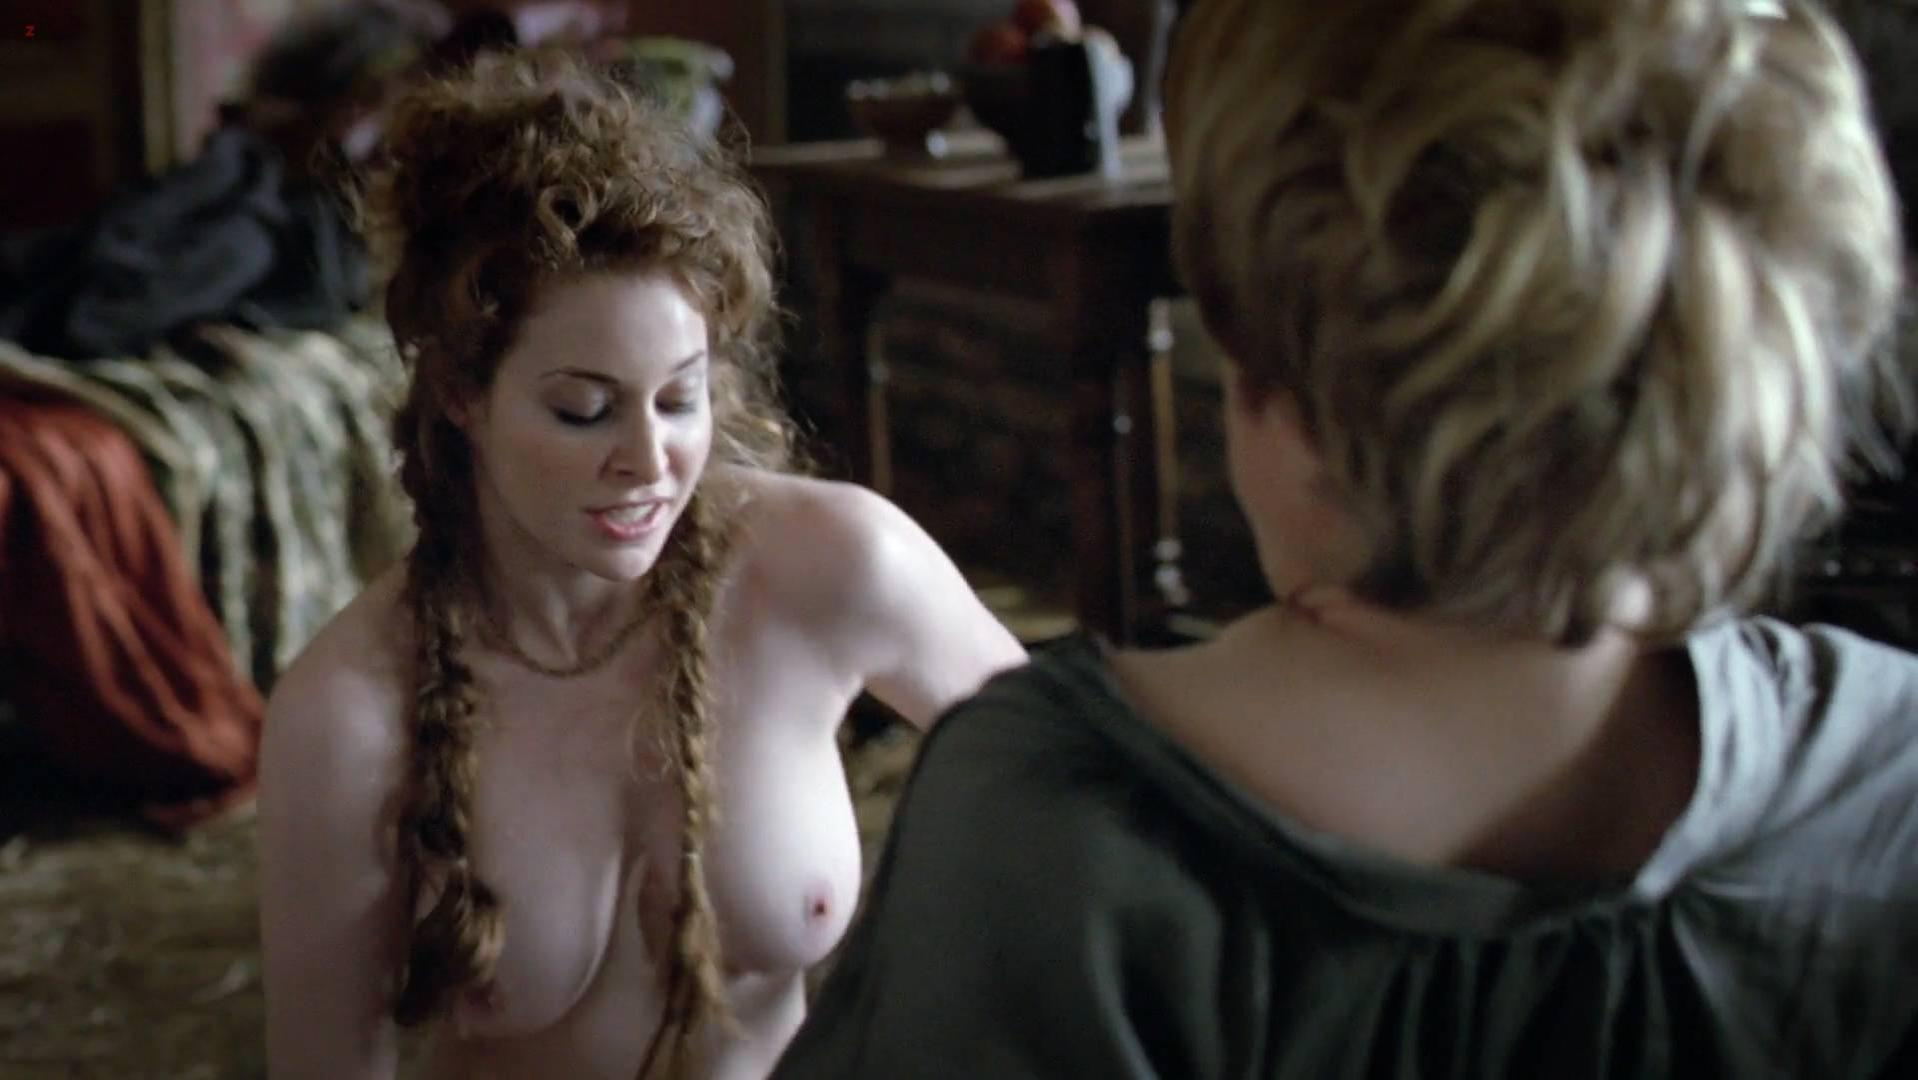 Esme Bianco nude - Game of Thrones s01e01 (2011)